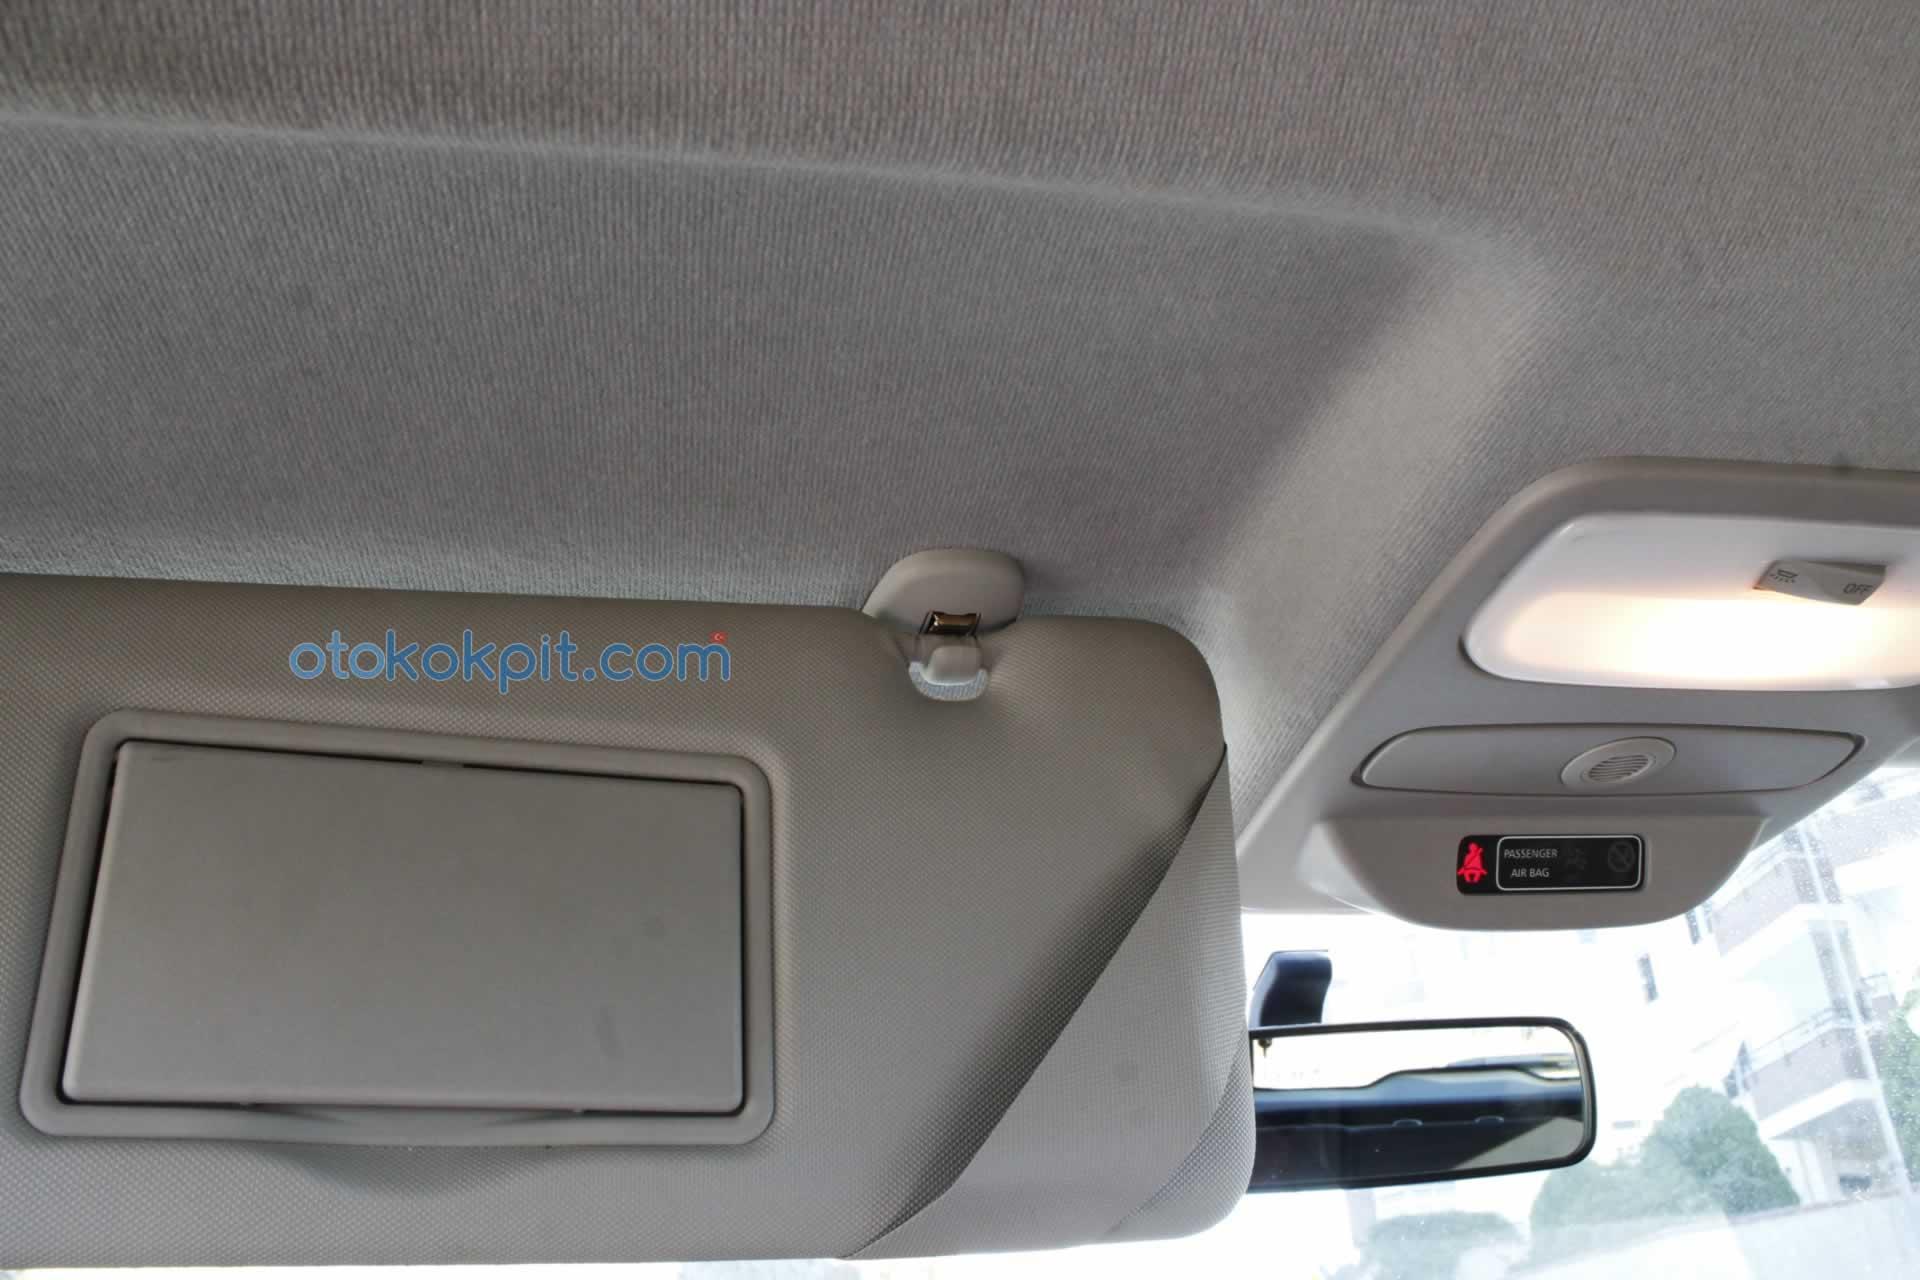 Renault Clio 4 Joy 1.5 dCi Yaşam Alanı